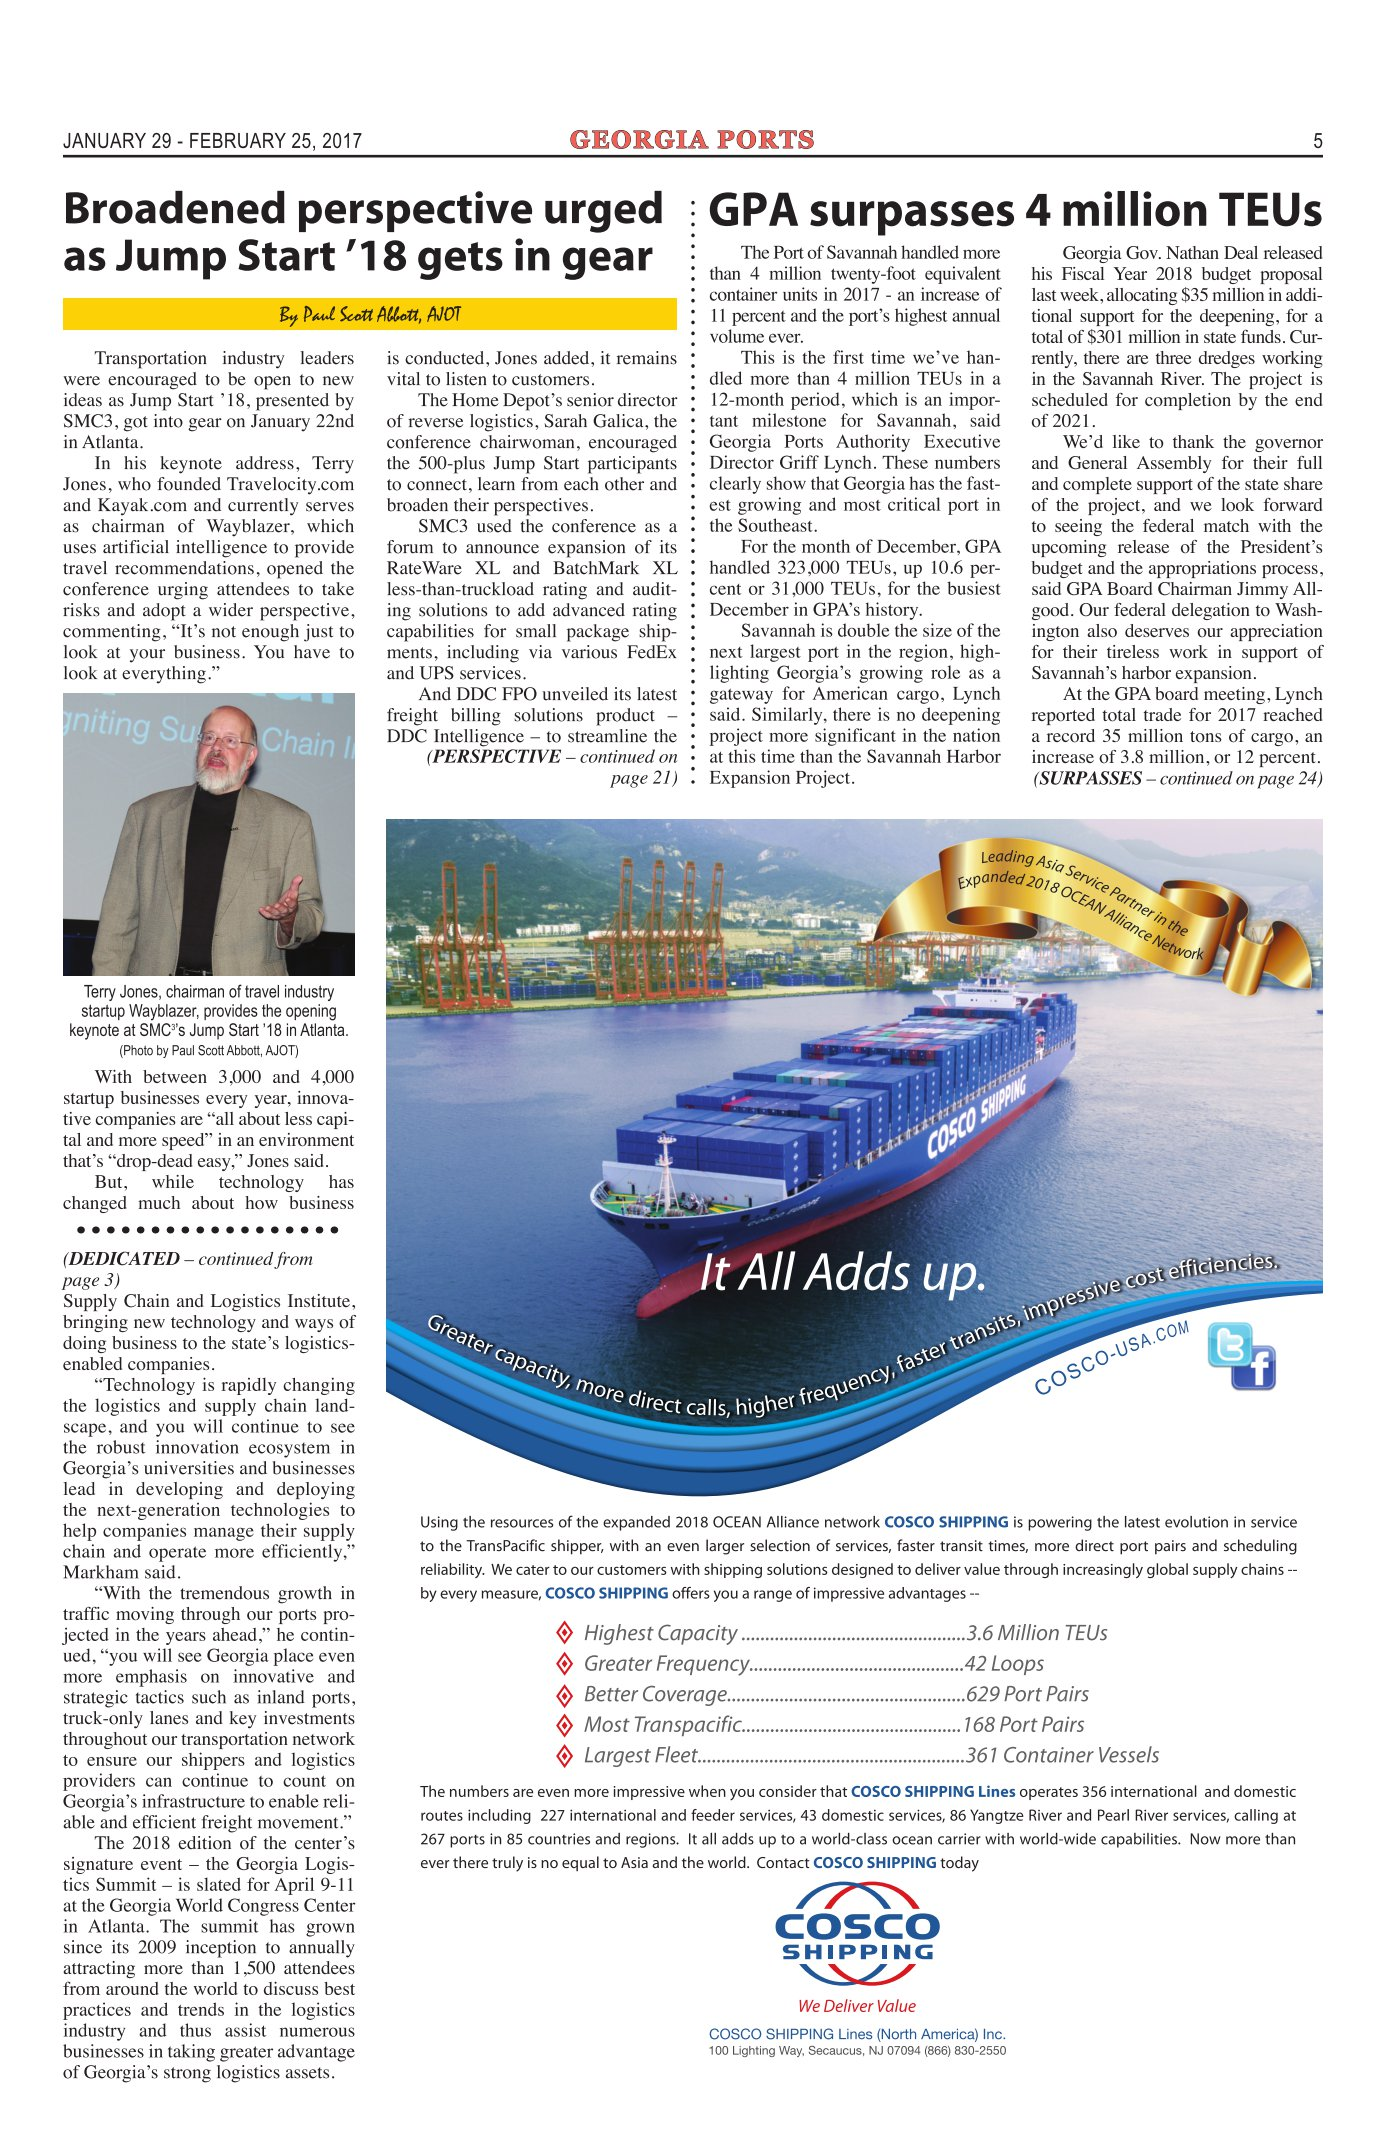 AJOT DIgital Edition | Issue #663 | Georgia Ports | Delaware